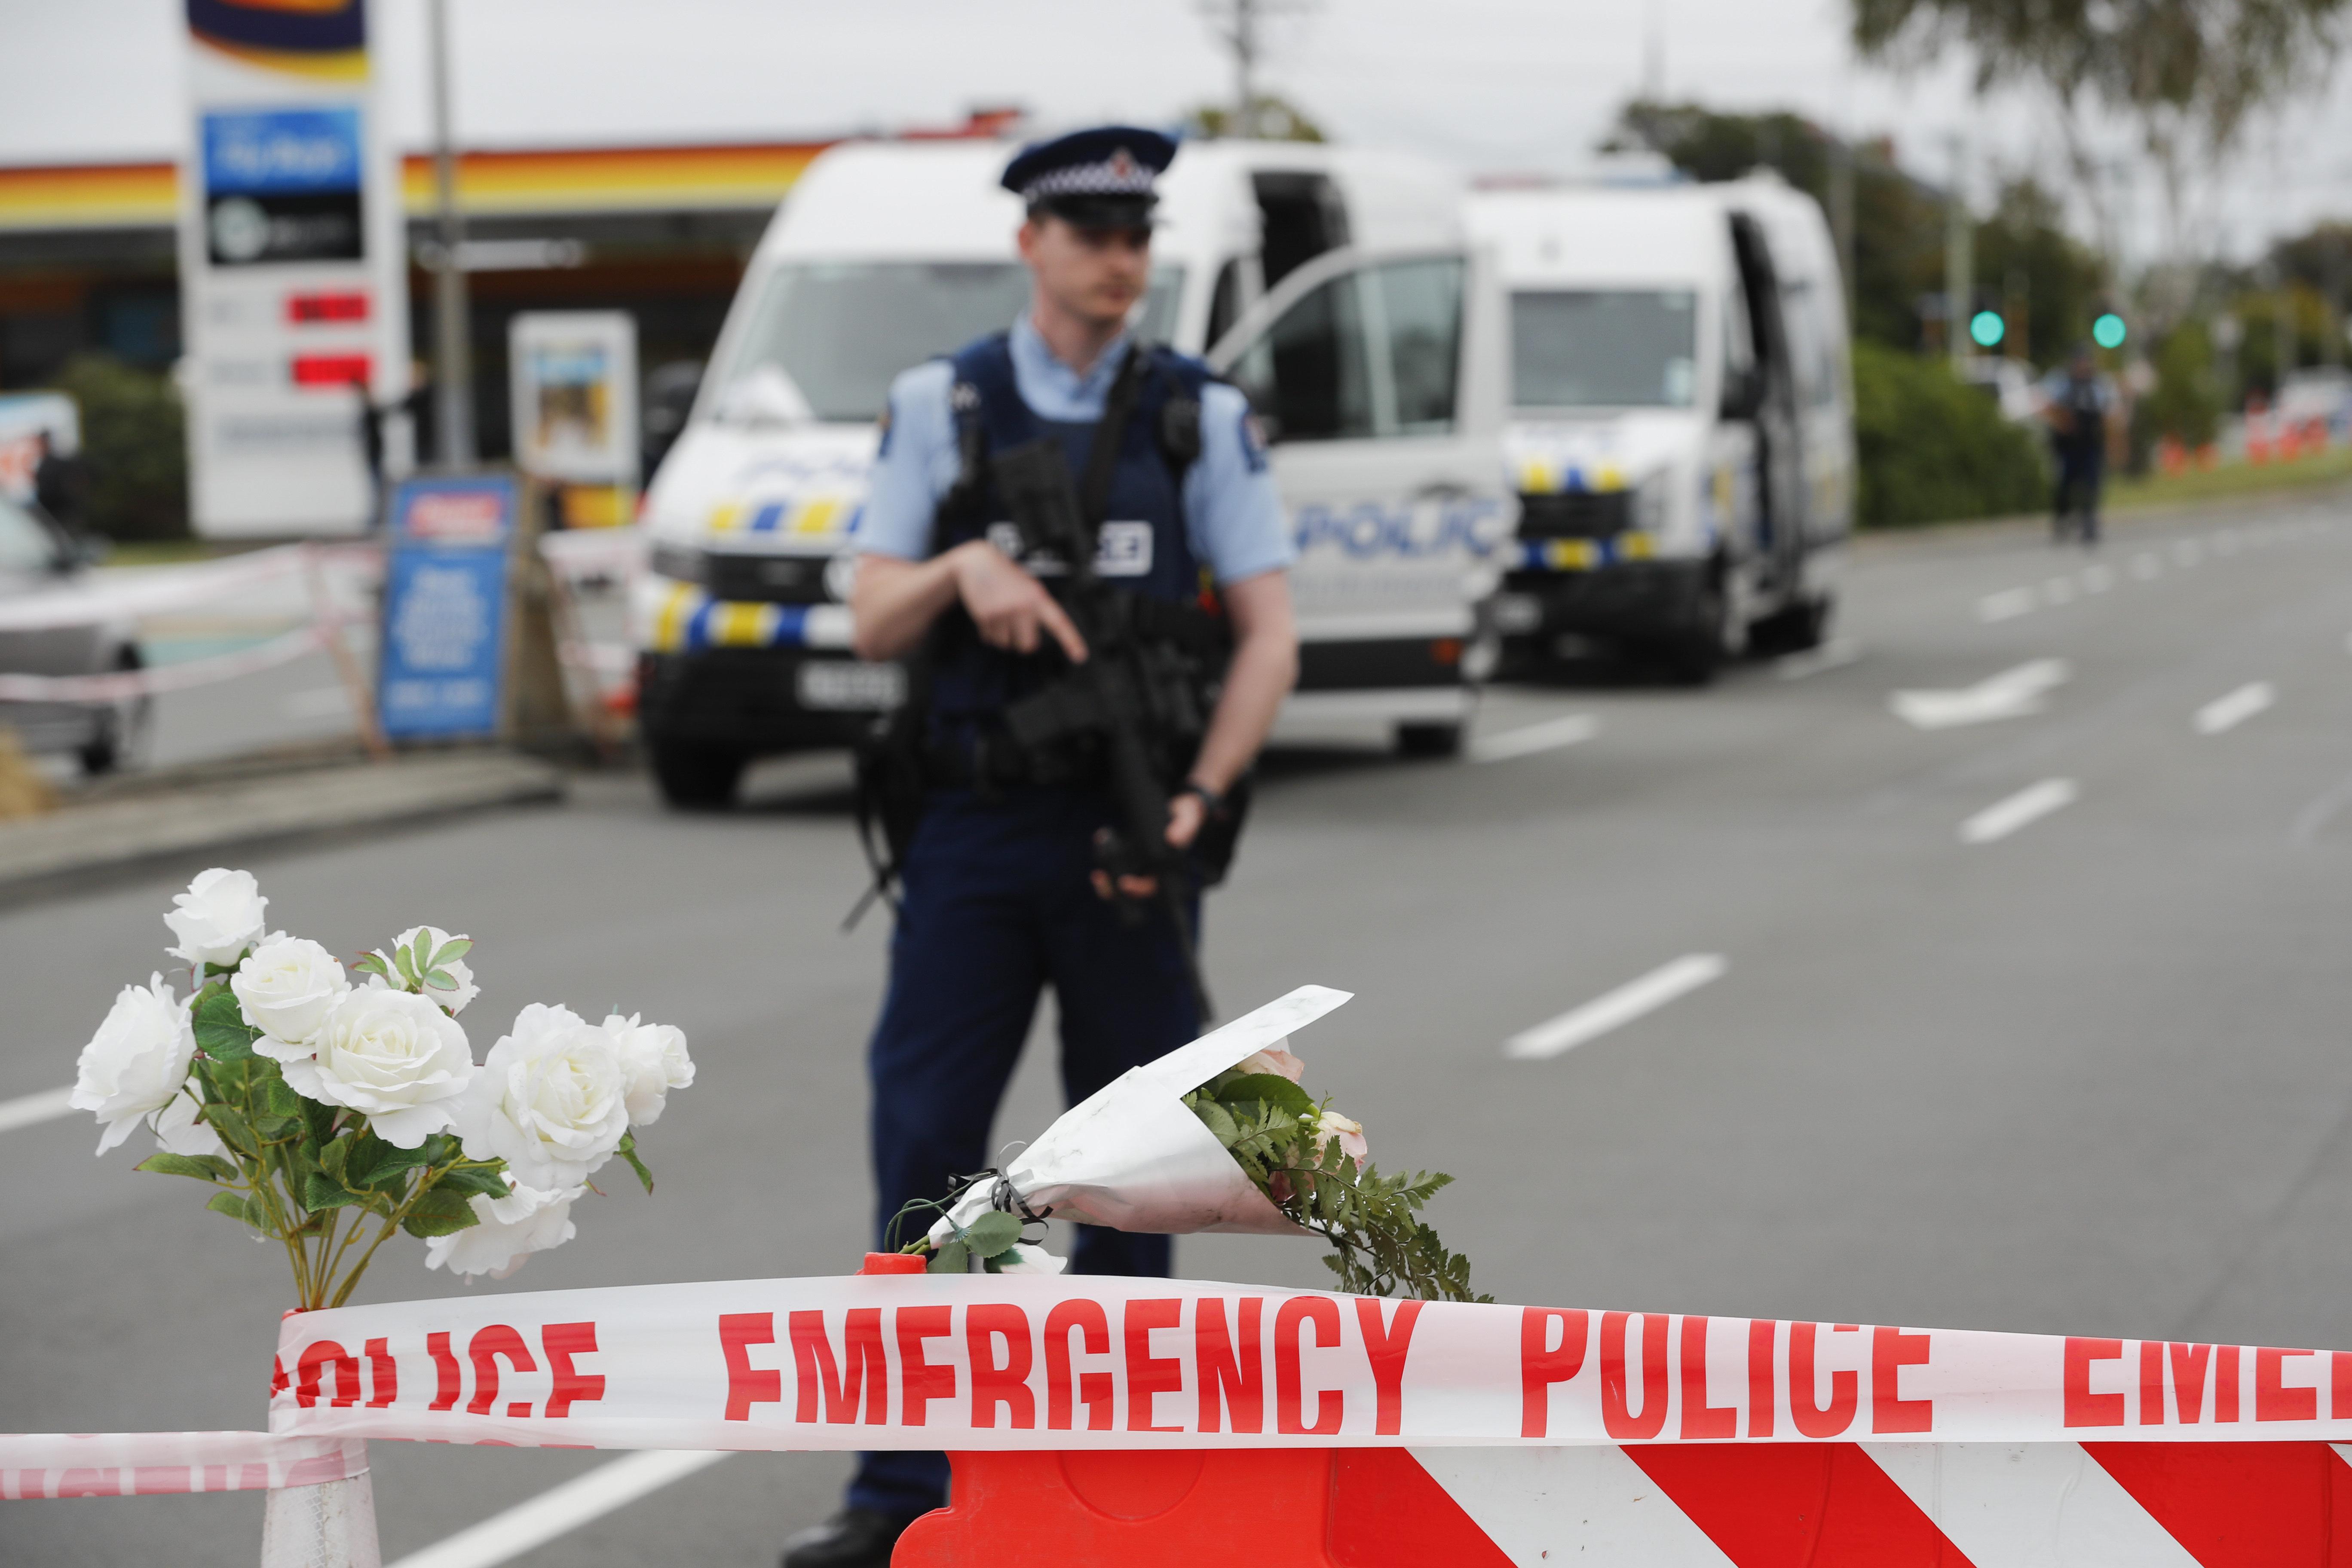 Shooting In New Zealand Facebook: Facebook Says Users Watched New Zealand Shooting In Real